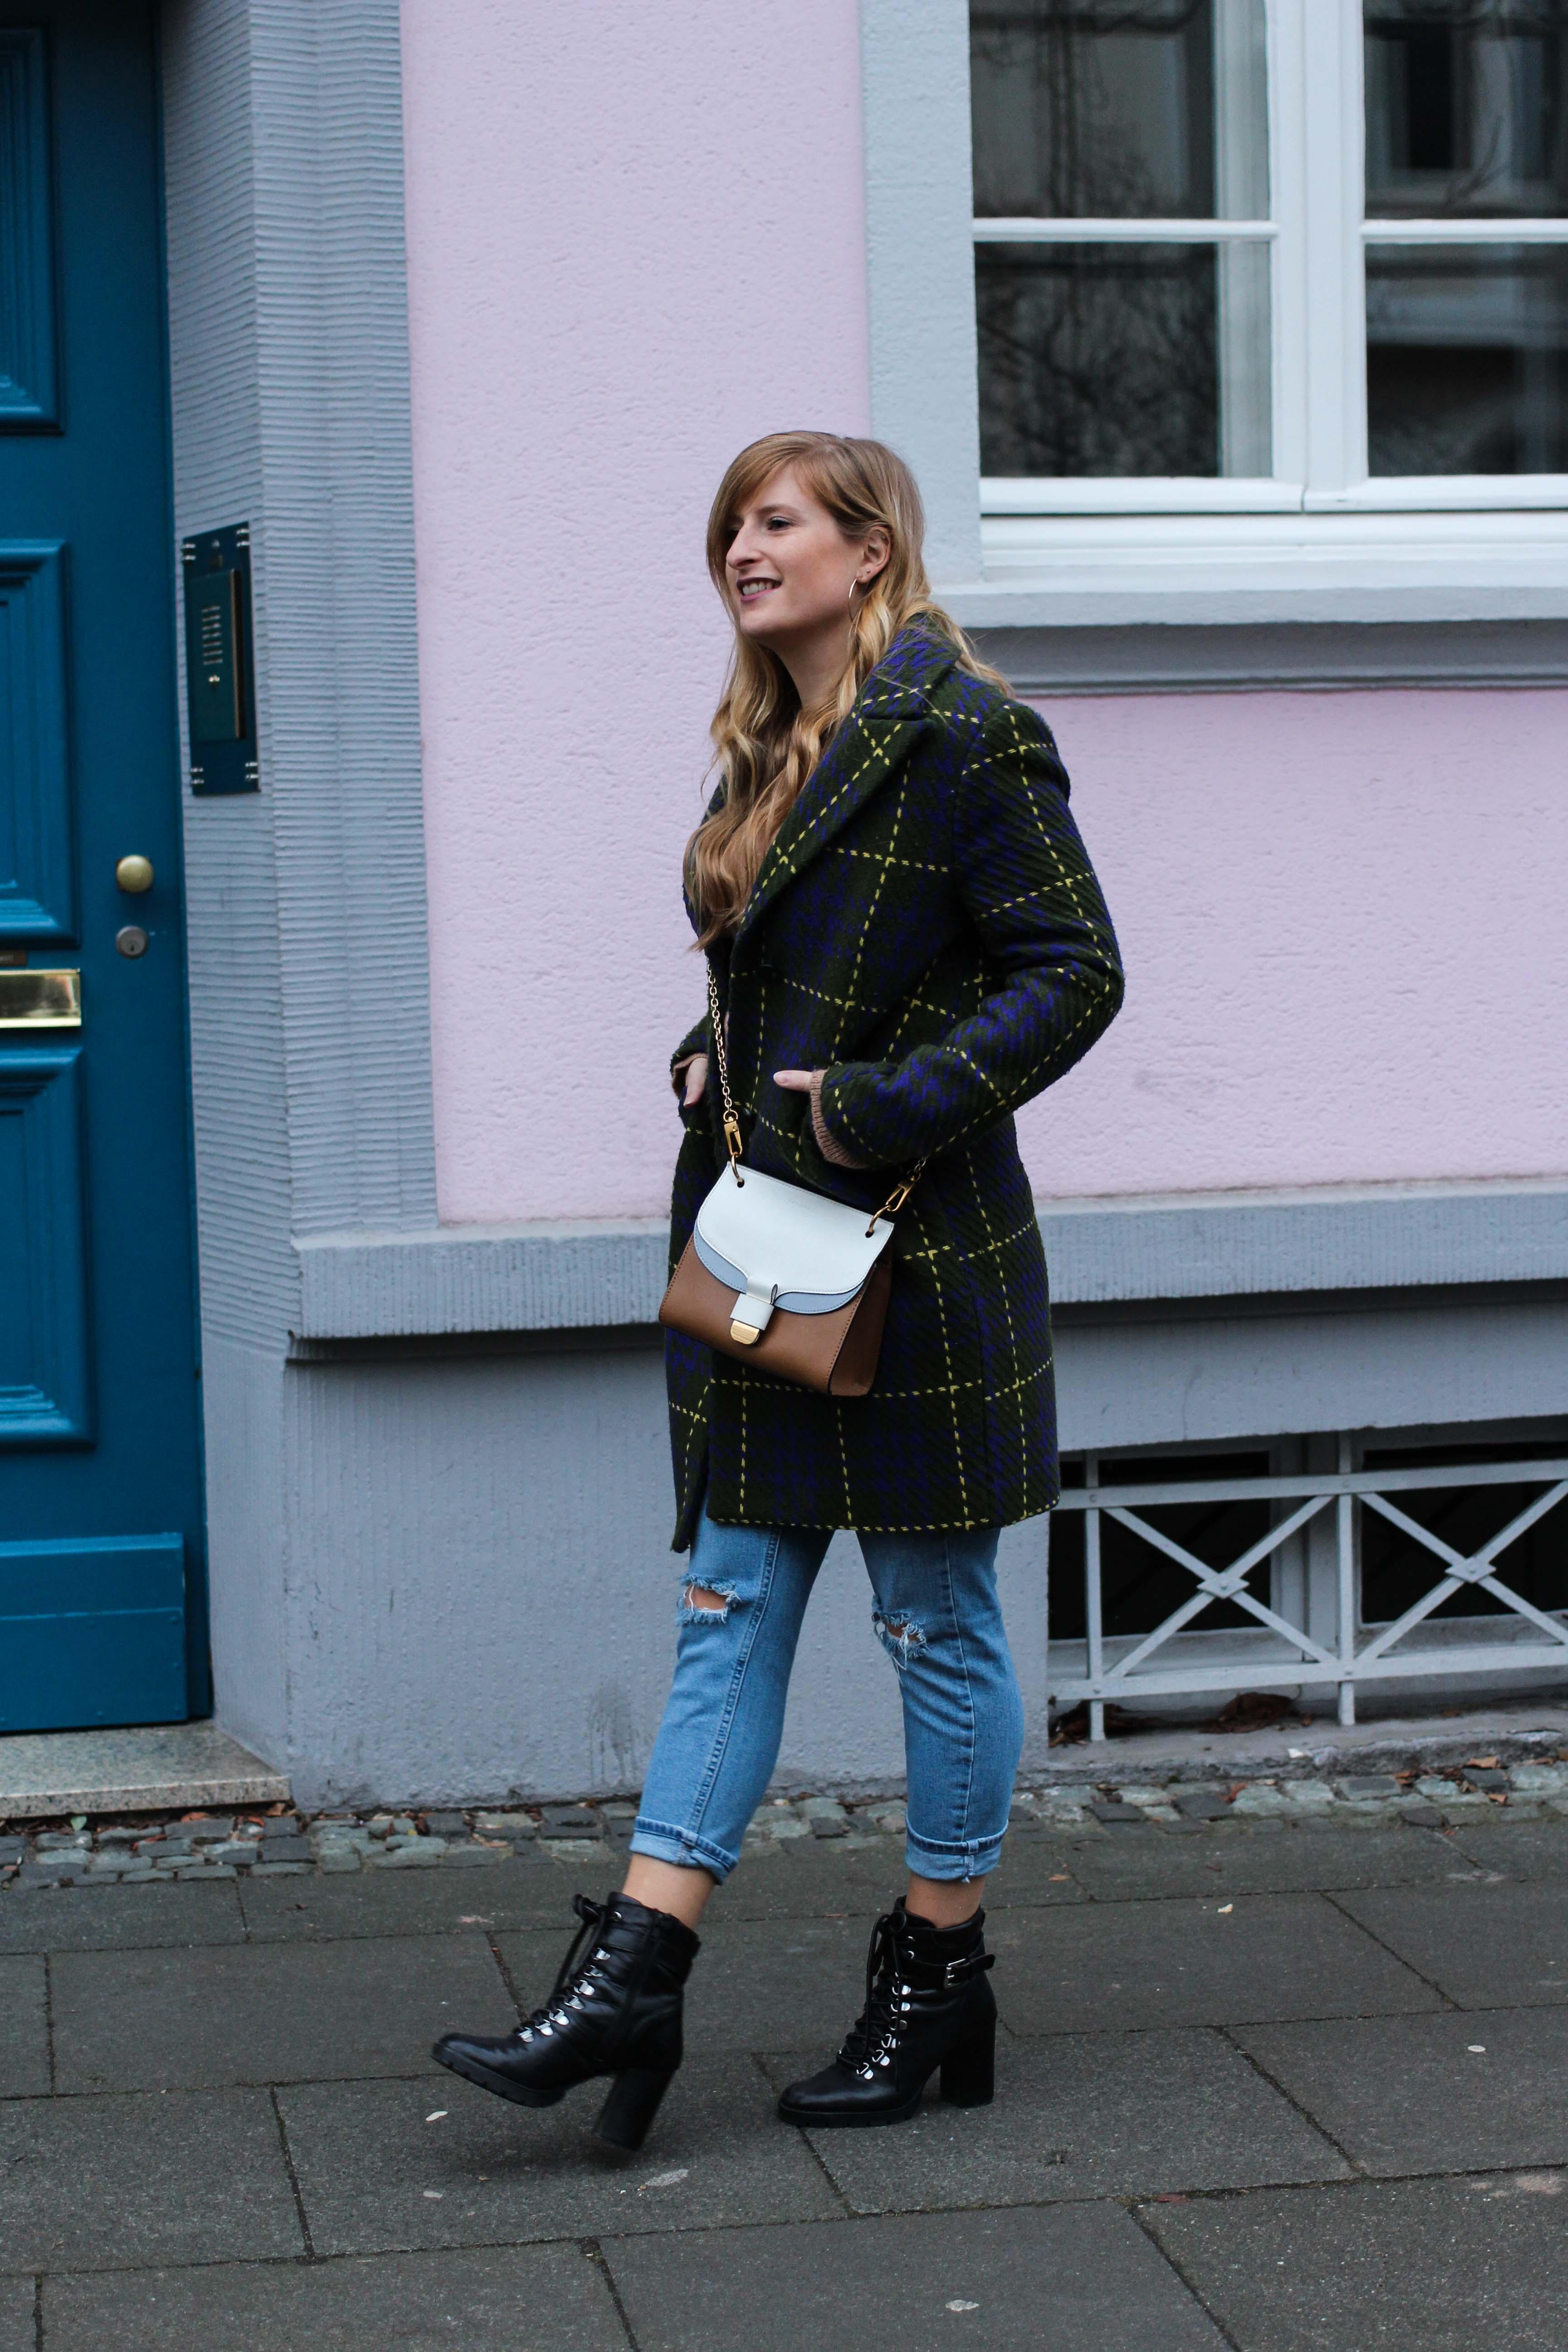 Herbst Must-Have 2019 Karomantel. Herbstmode Herbsttrend Mantel karriert Modeblog Outfit Herbst Fashion Blog Bonn 3